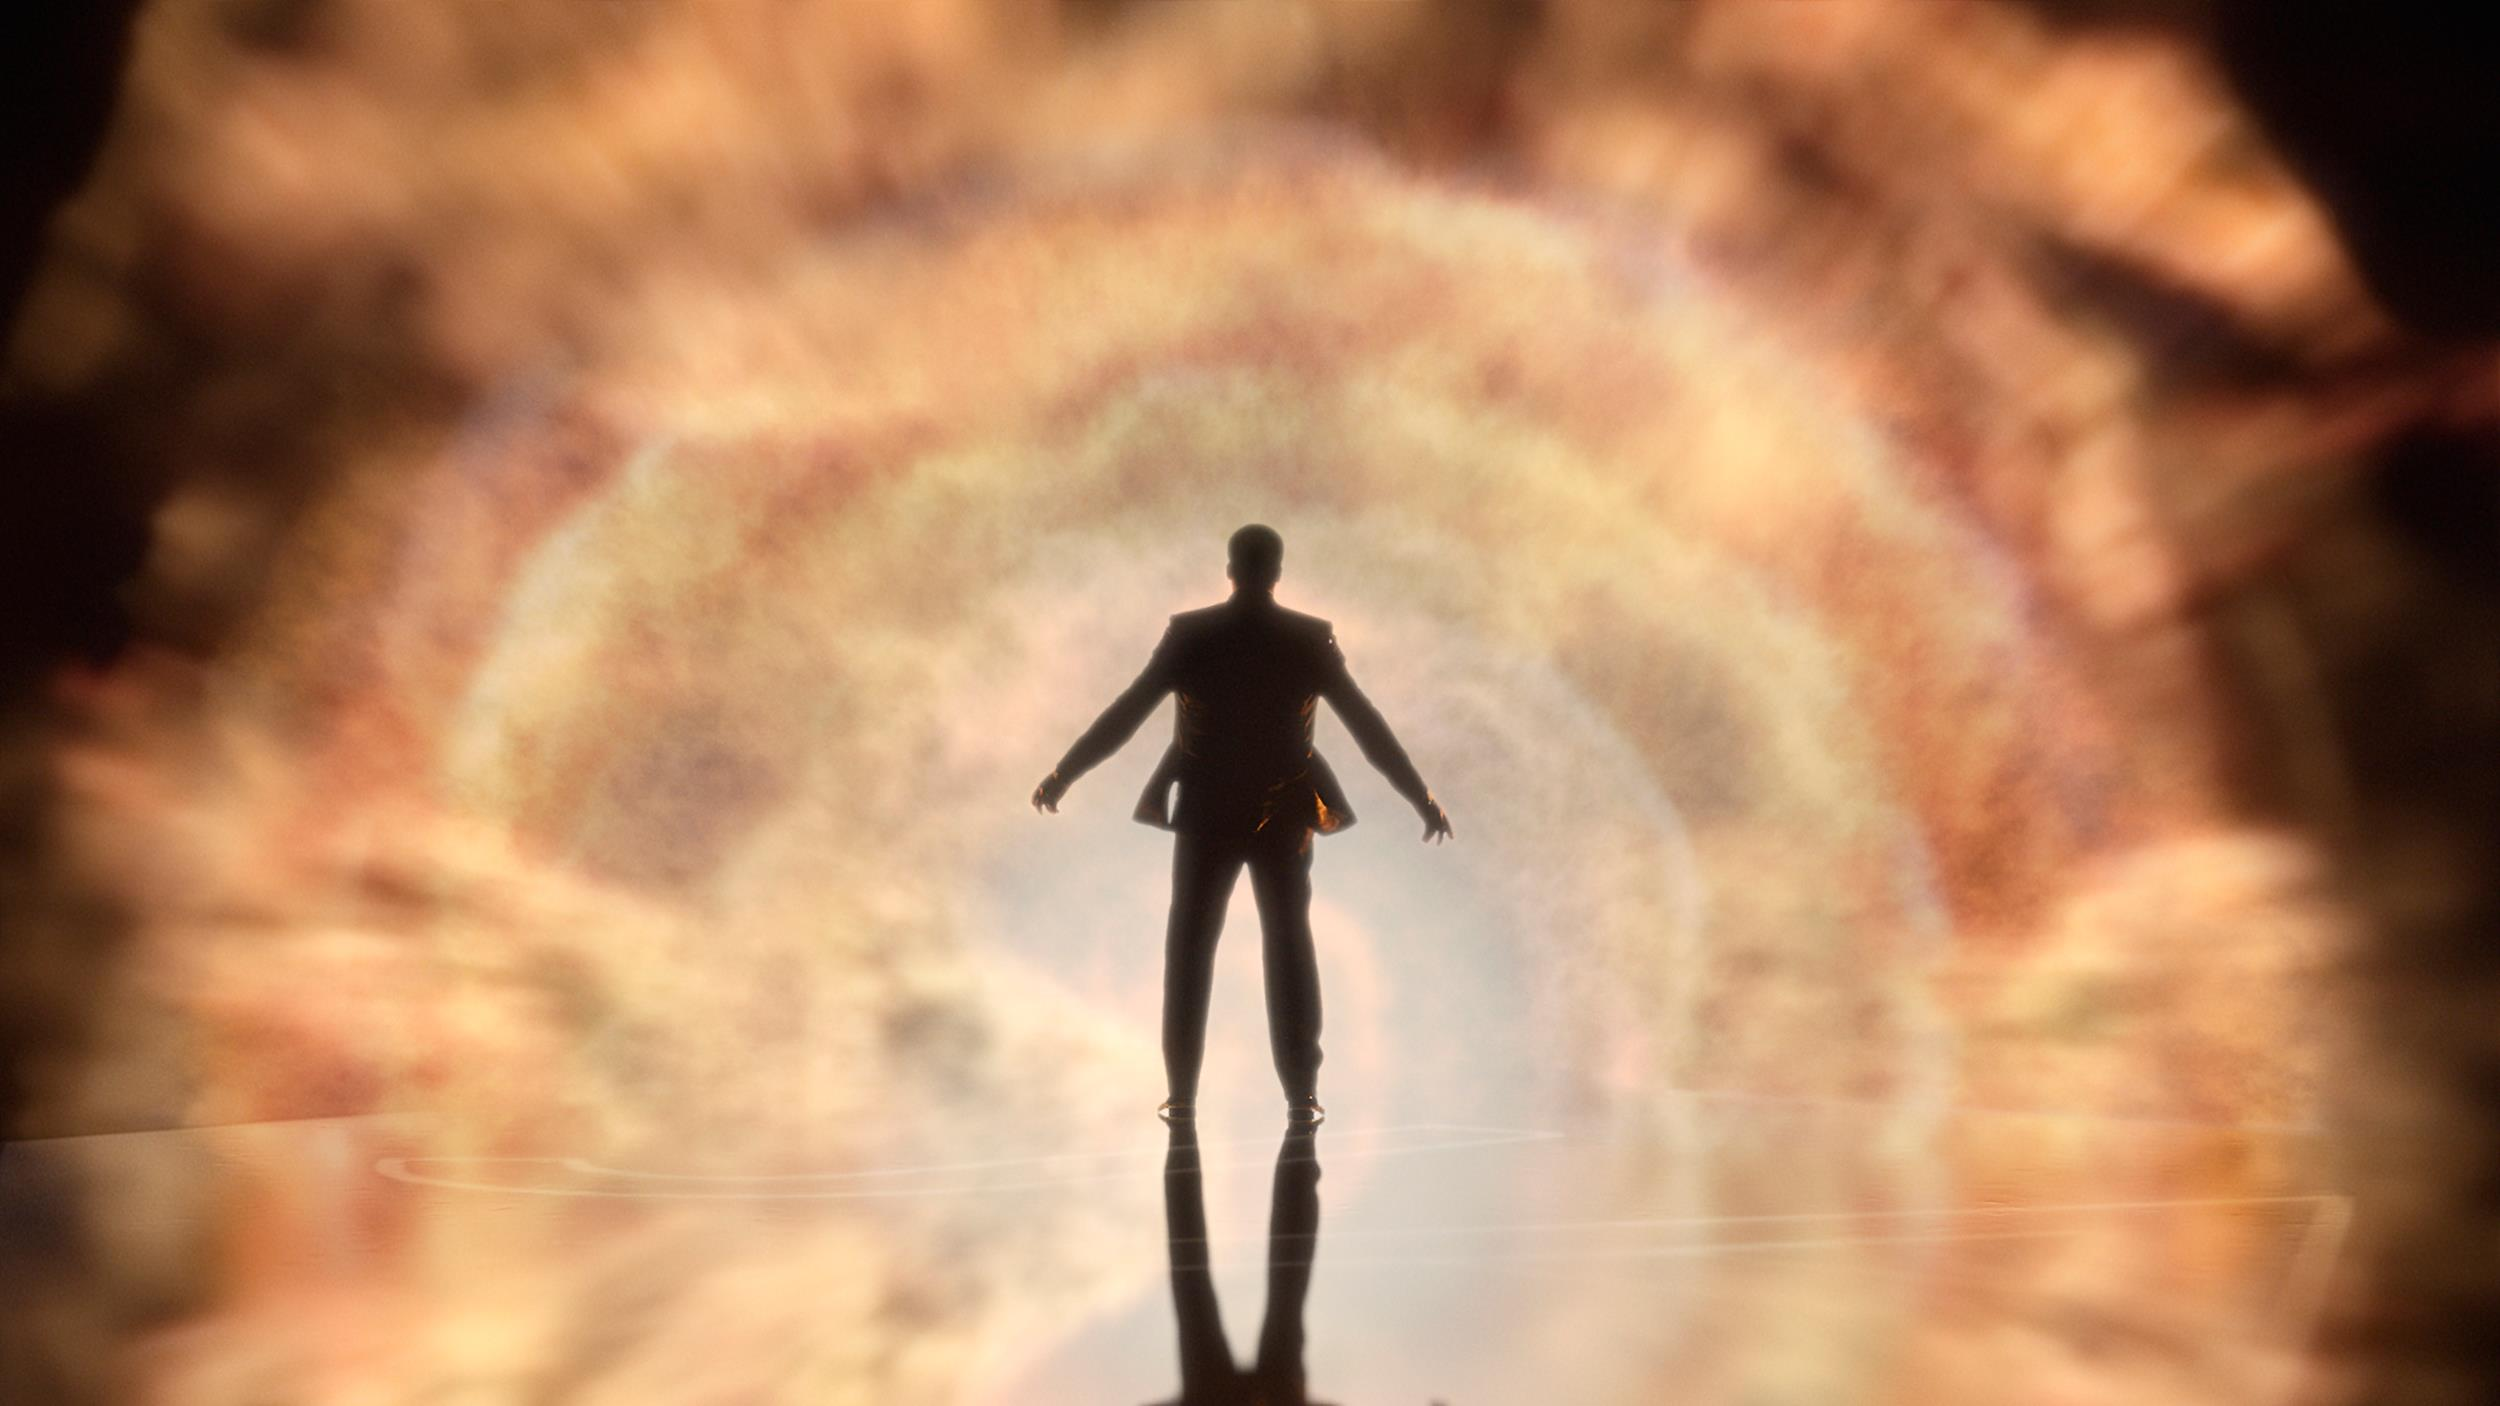 cosmos a spacetime odyssey vfx